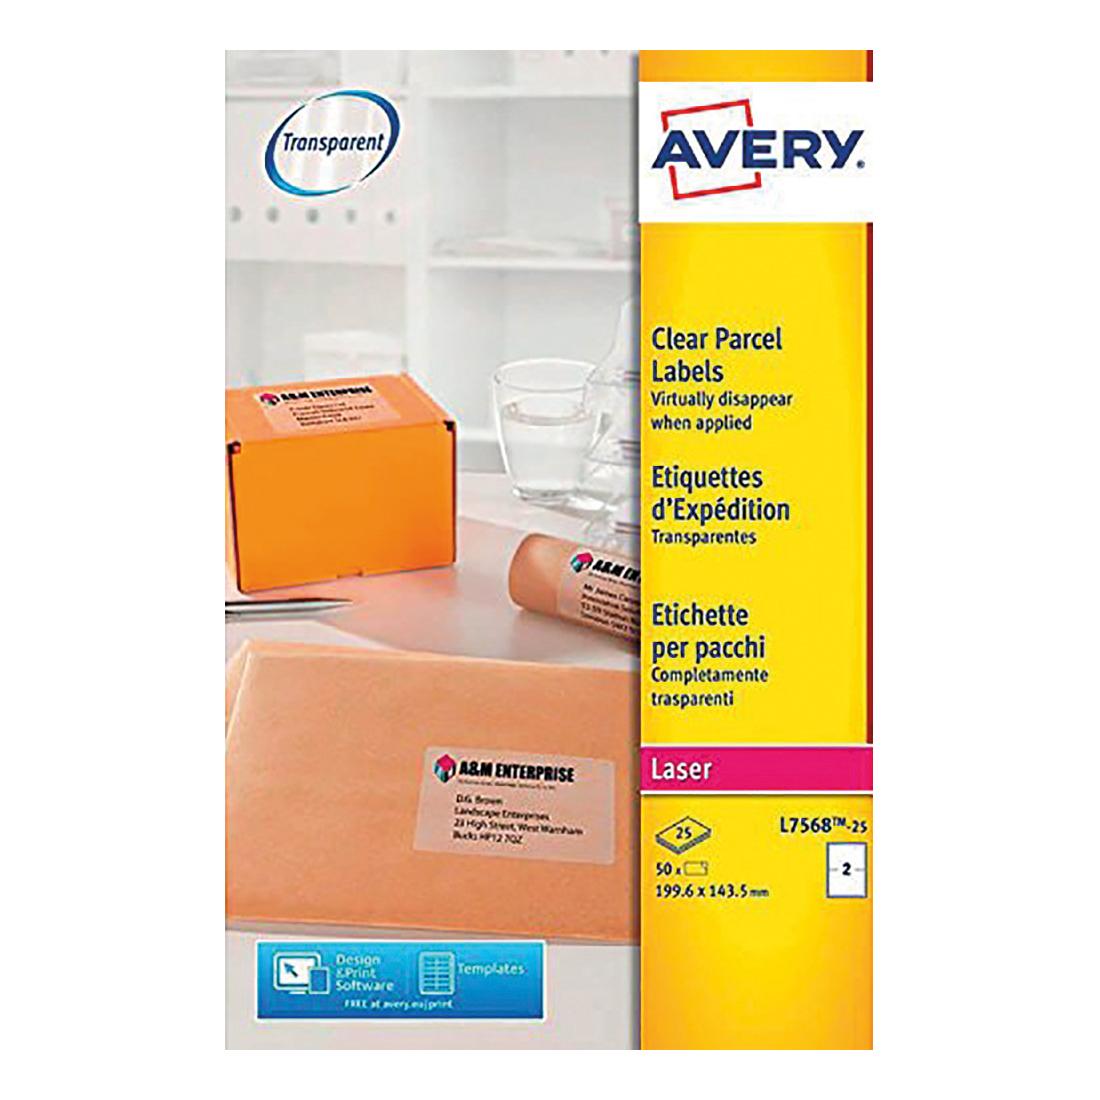 Avery Parcel Labels Laser 2 per Sheet 199.6x143.5mm Transparent Ref L7568-25 [50 Labels]